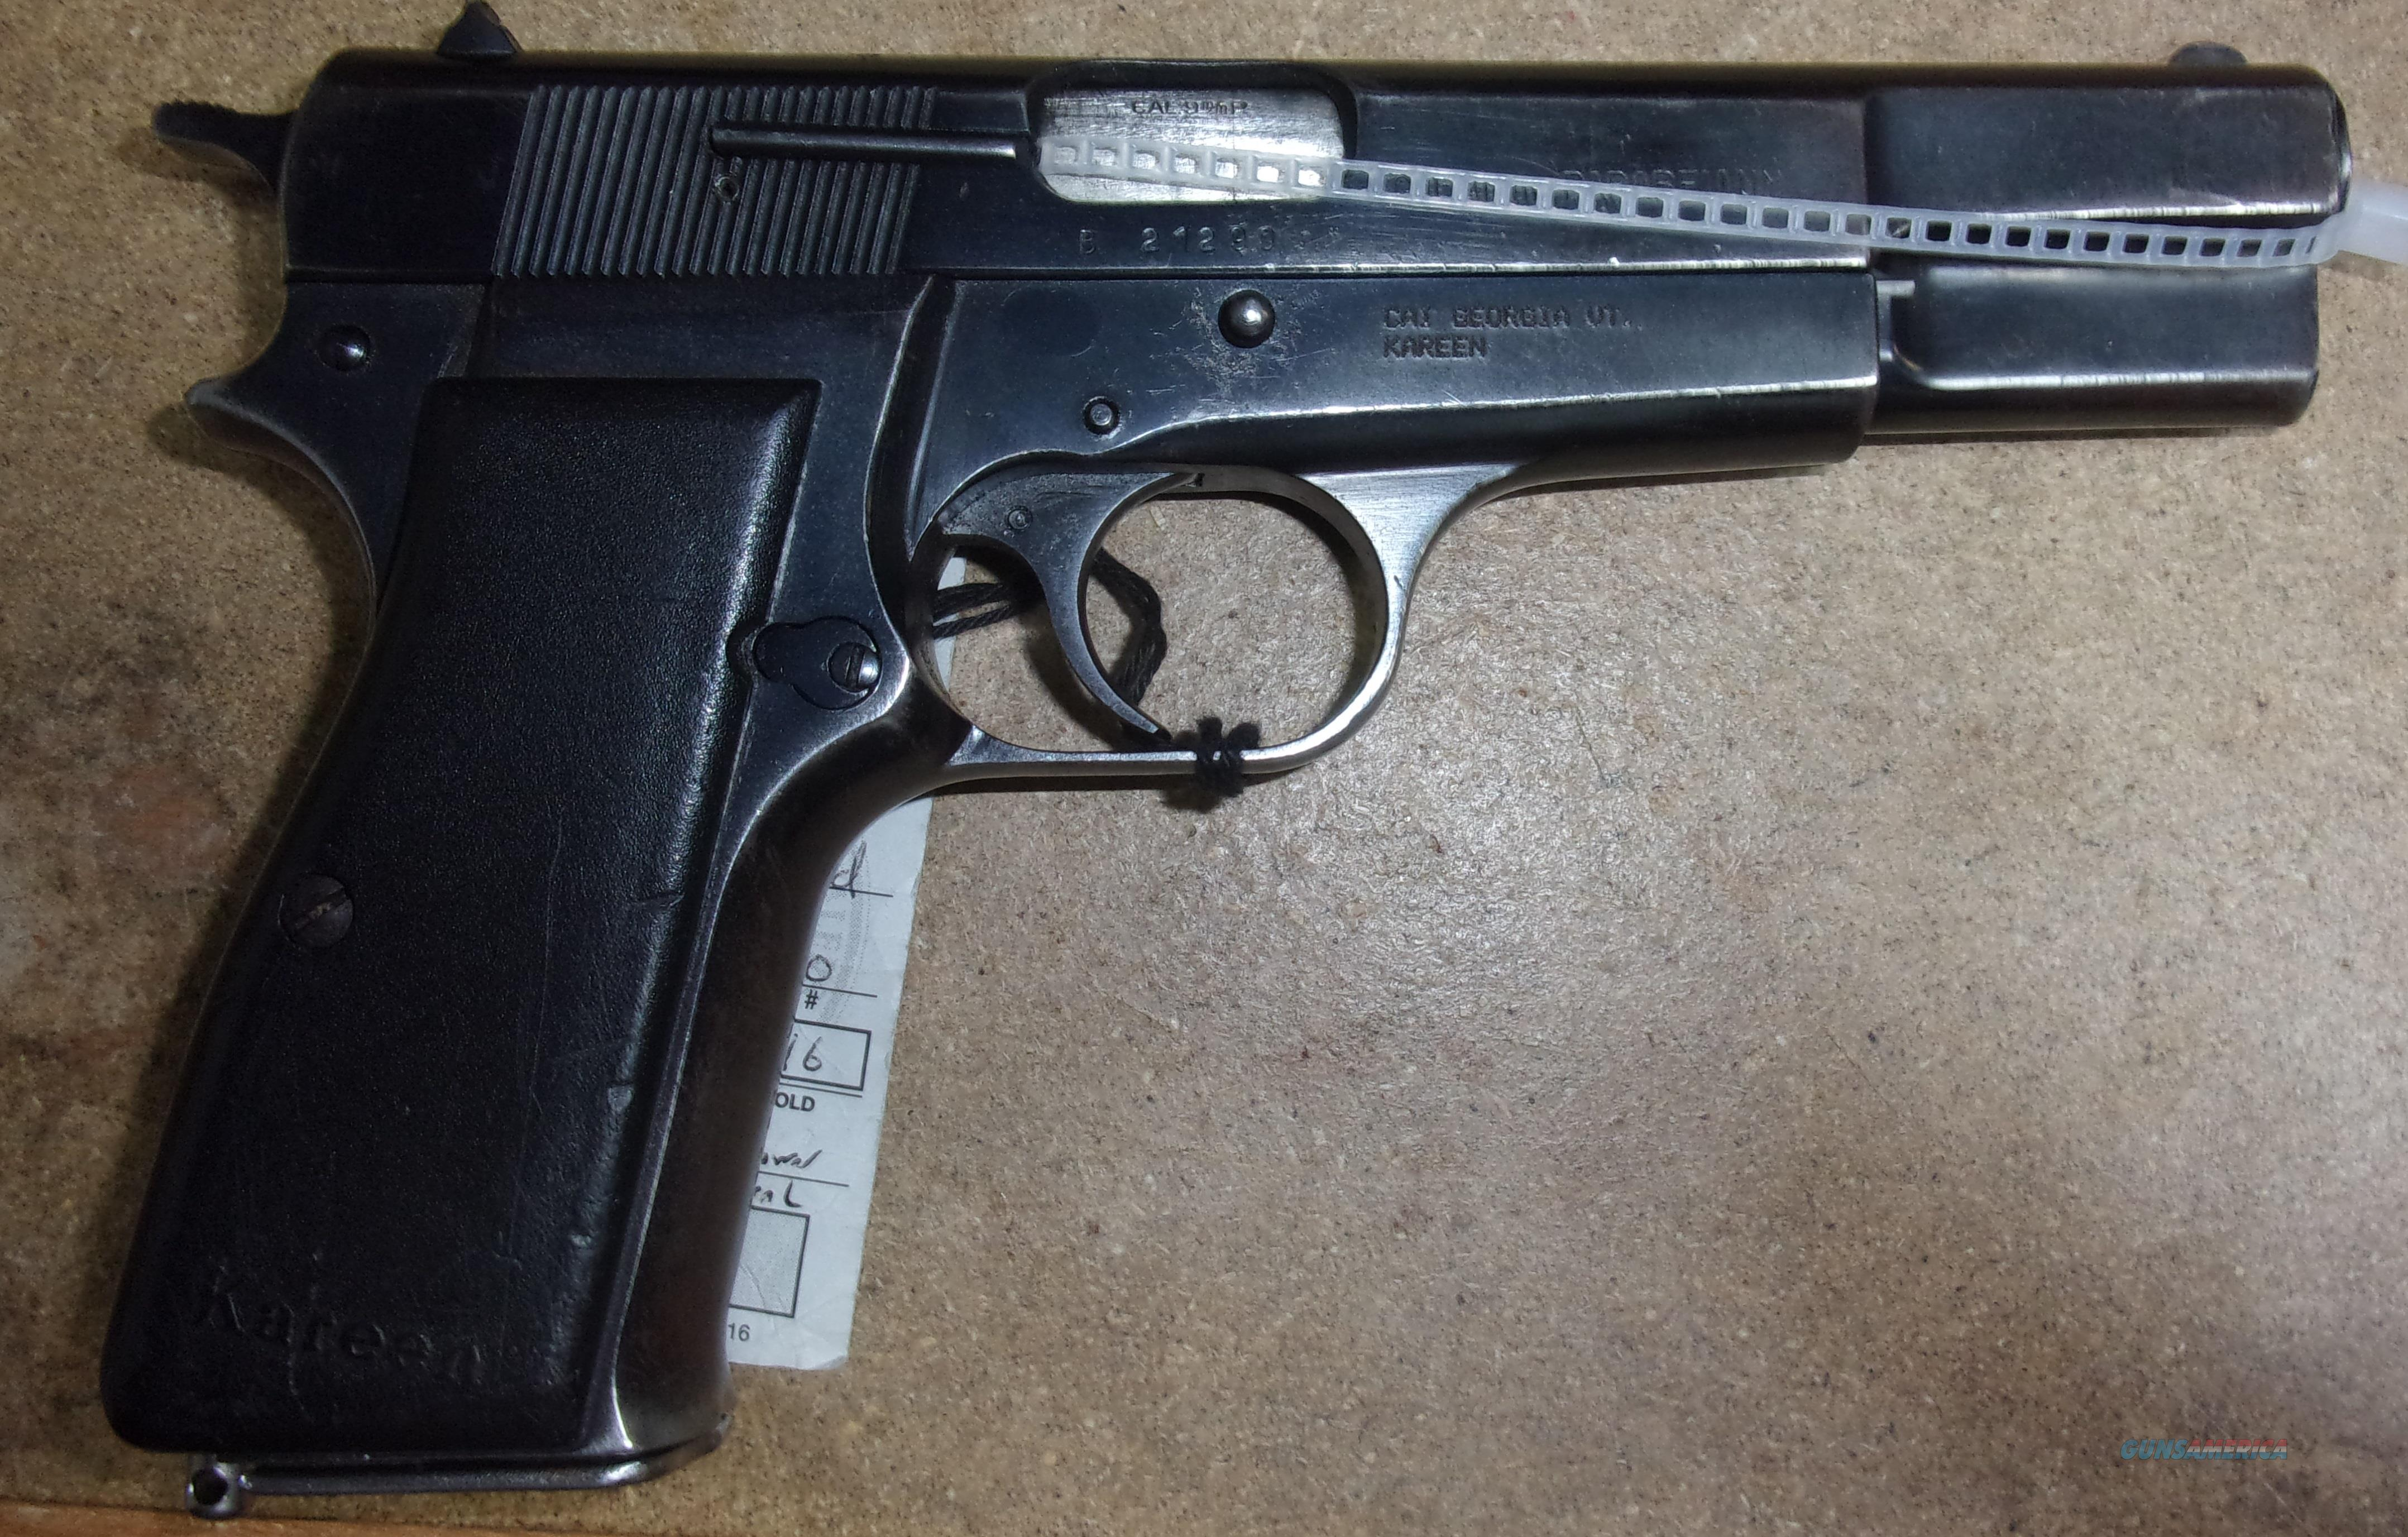 J.O. Israel Arms Kareen  Guns > Pistols > IJ Misc Pistols